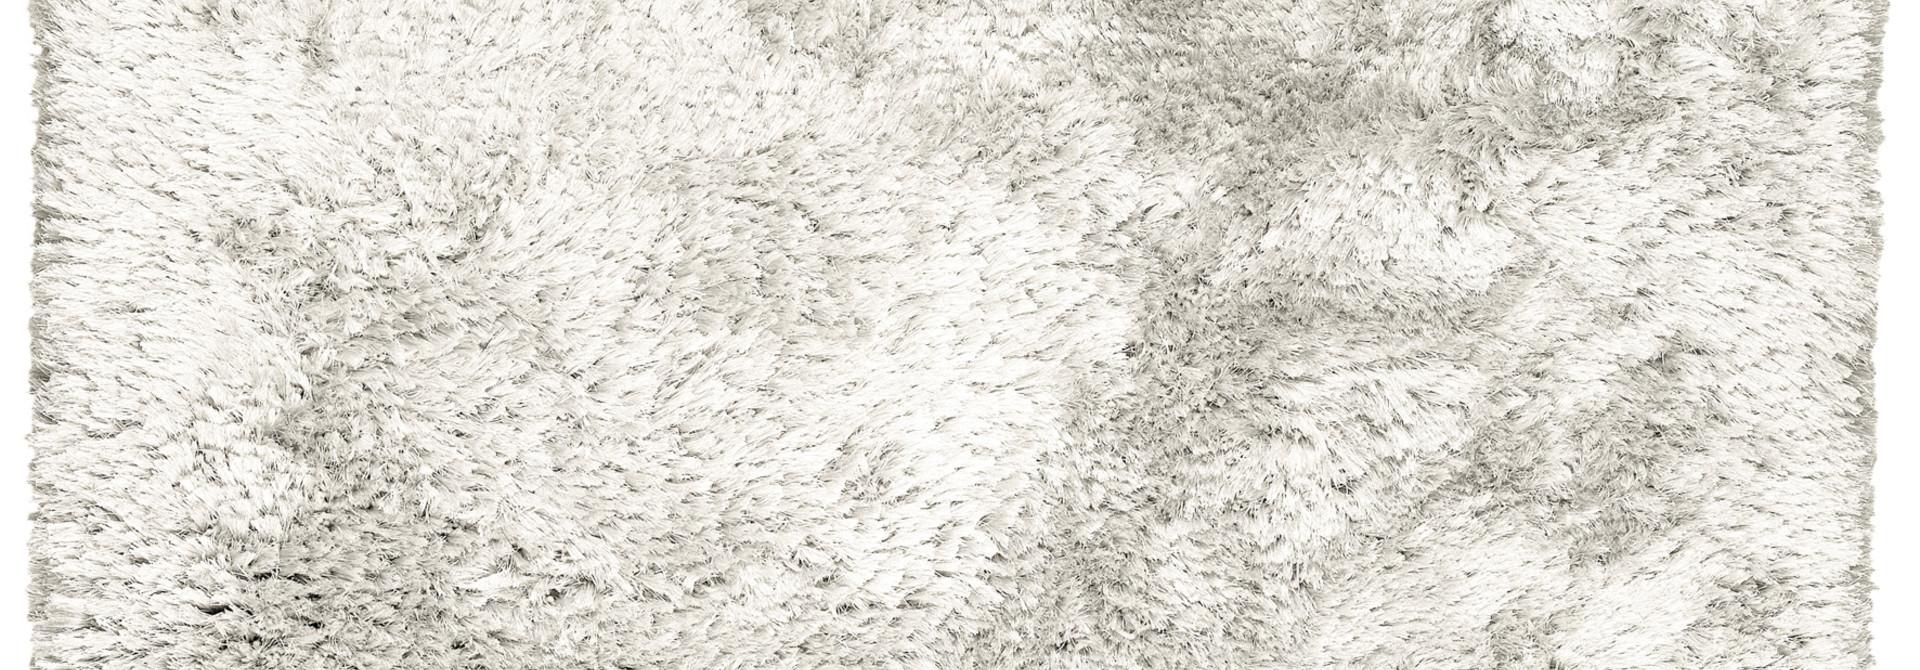 Vloerkleed Adore 900 170x240cm